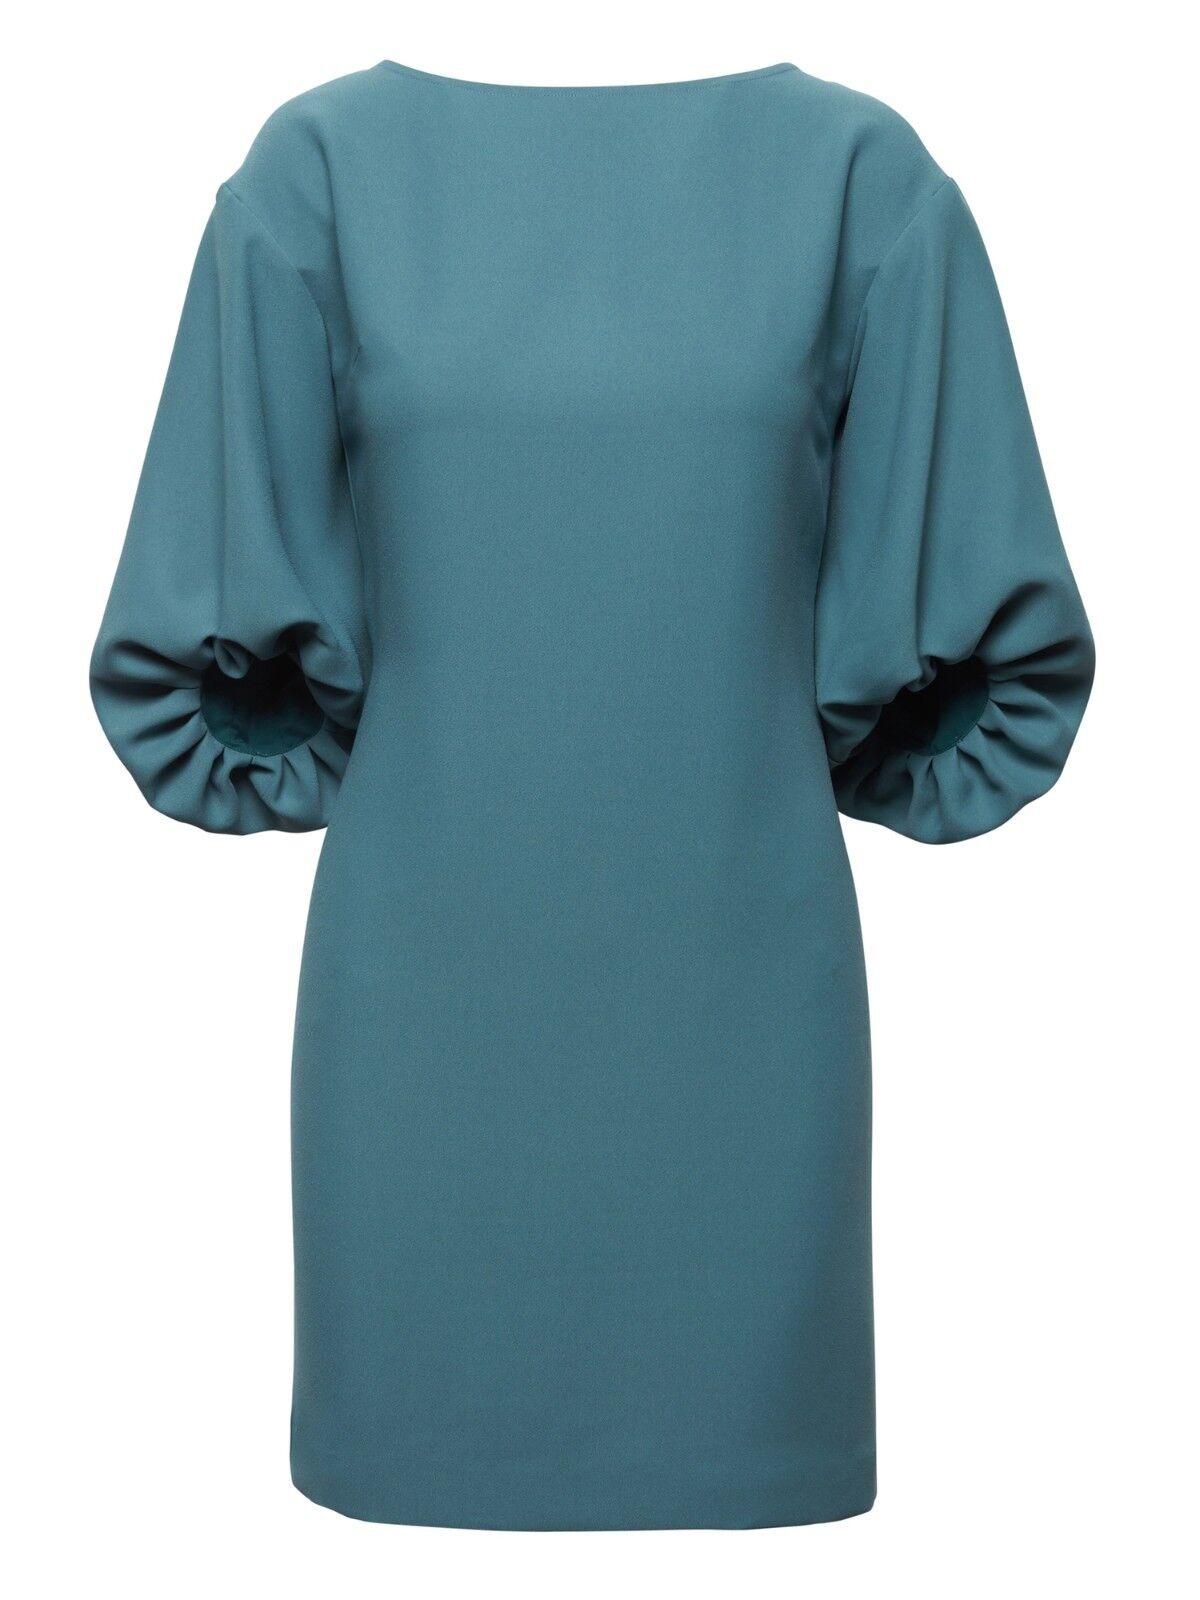 Banana Republic Balloon-Sleeve Dress,Amagansett Blau Größe 6T 6 T    E312